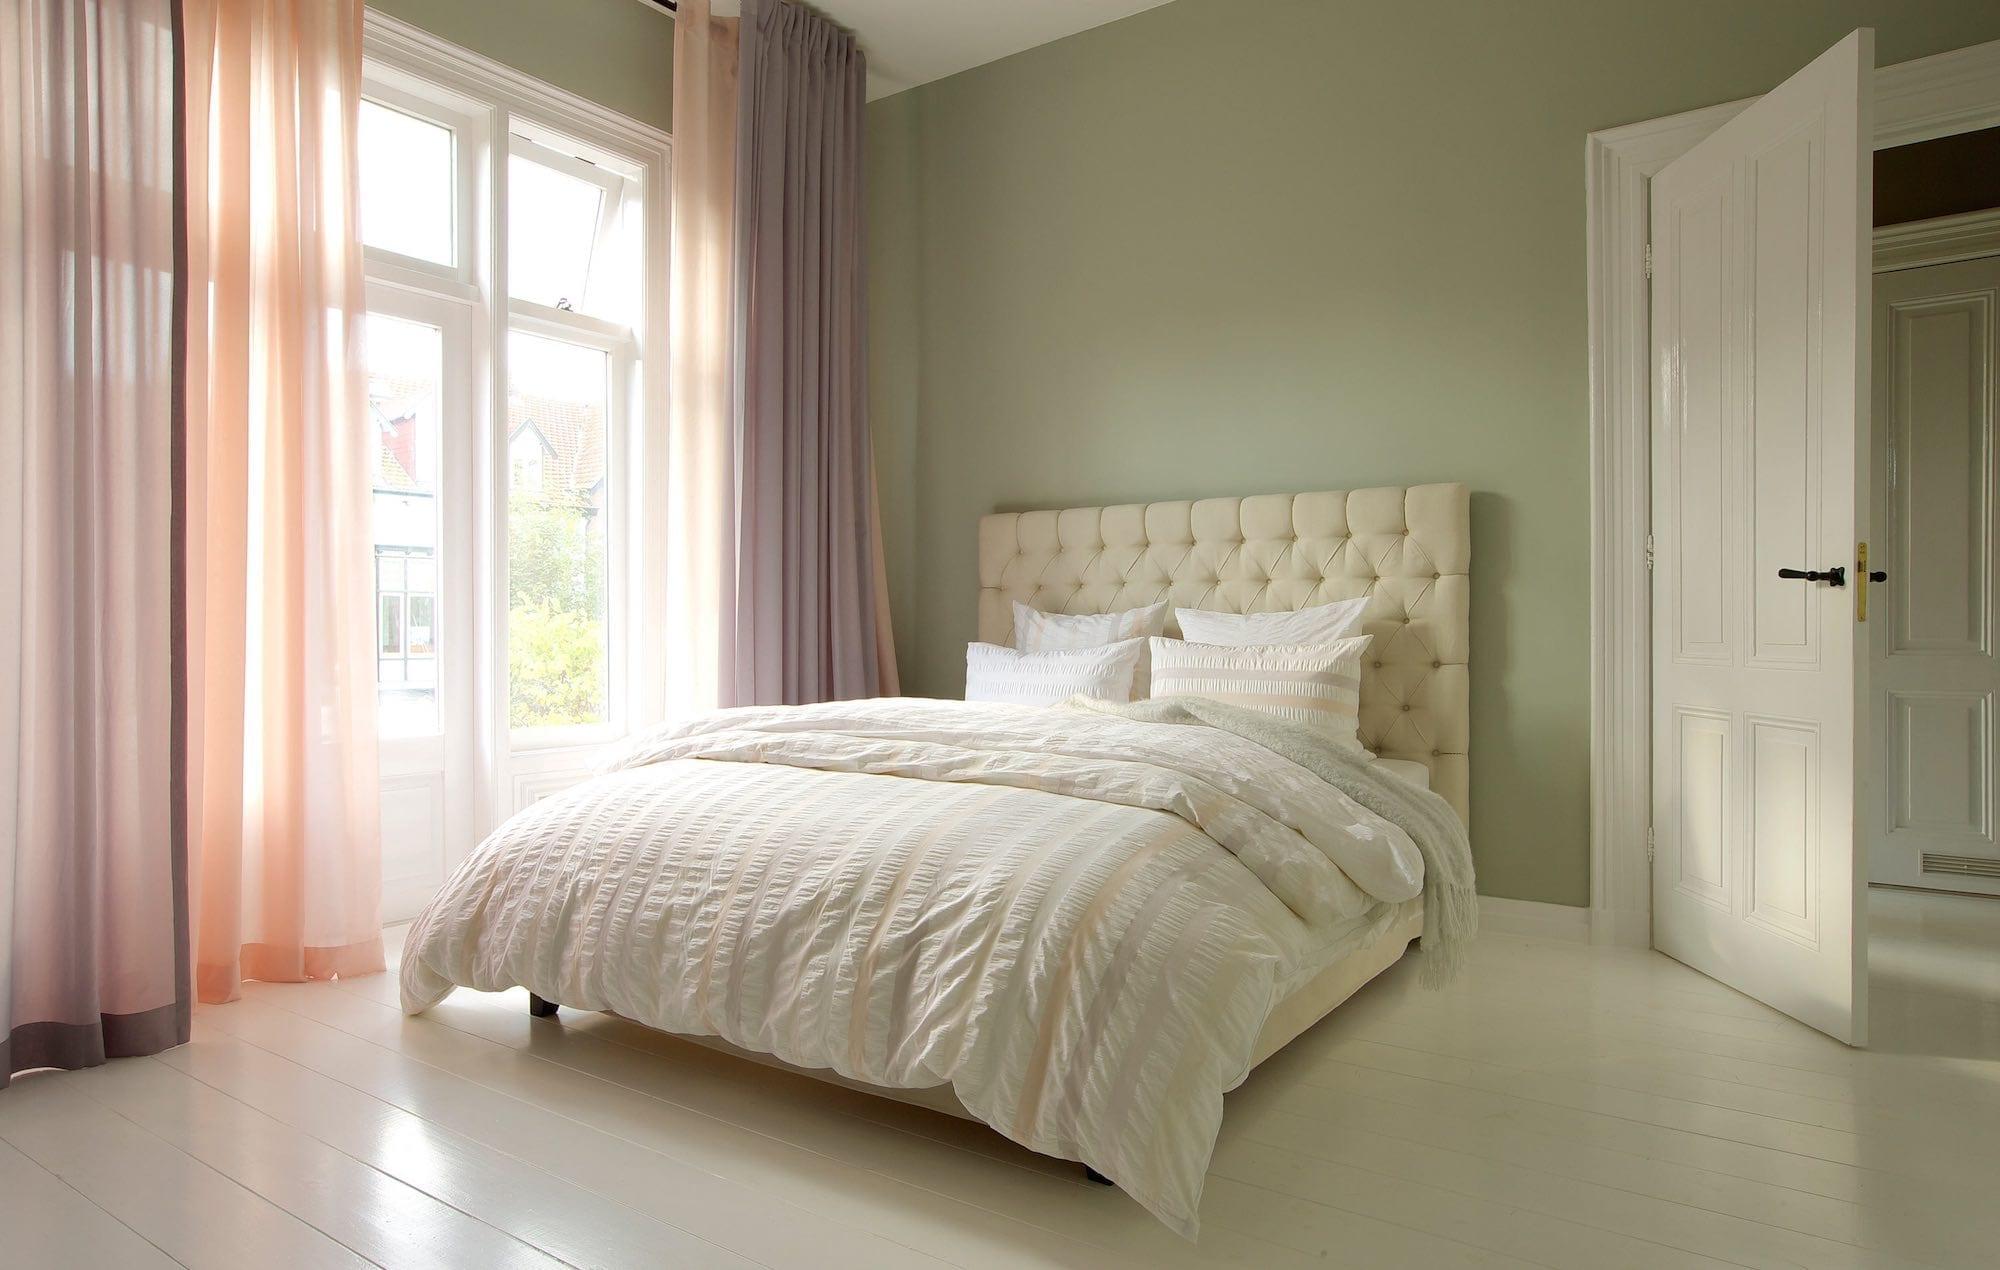 slaapkamer gordijnen vitrage